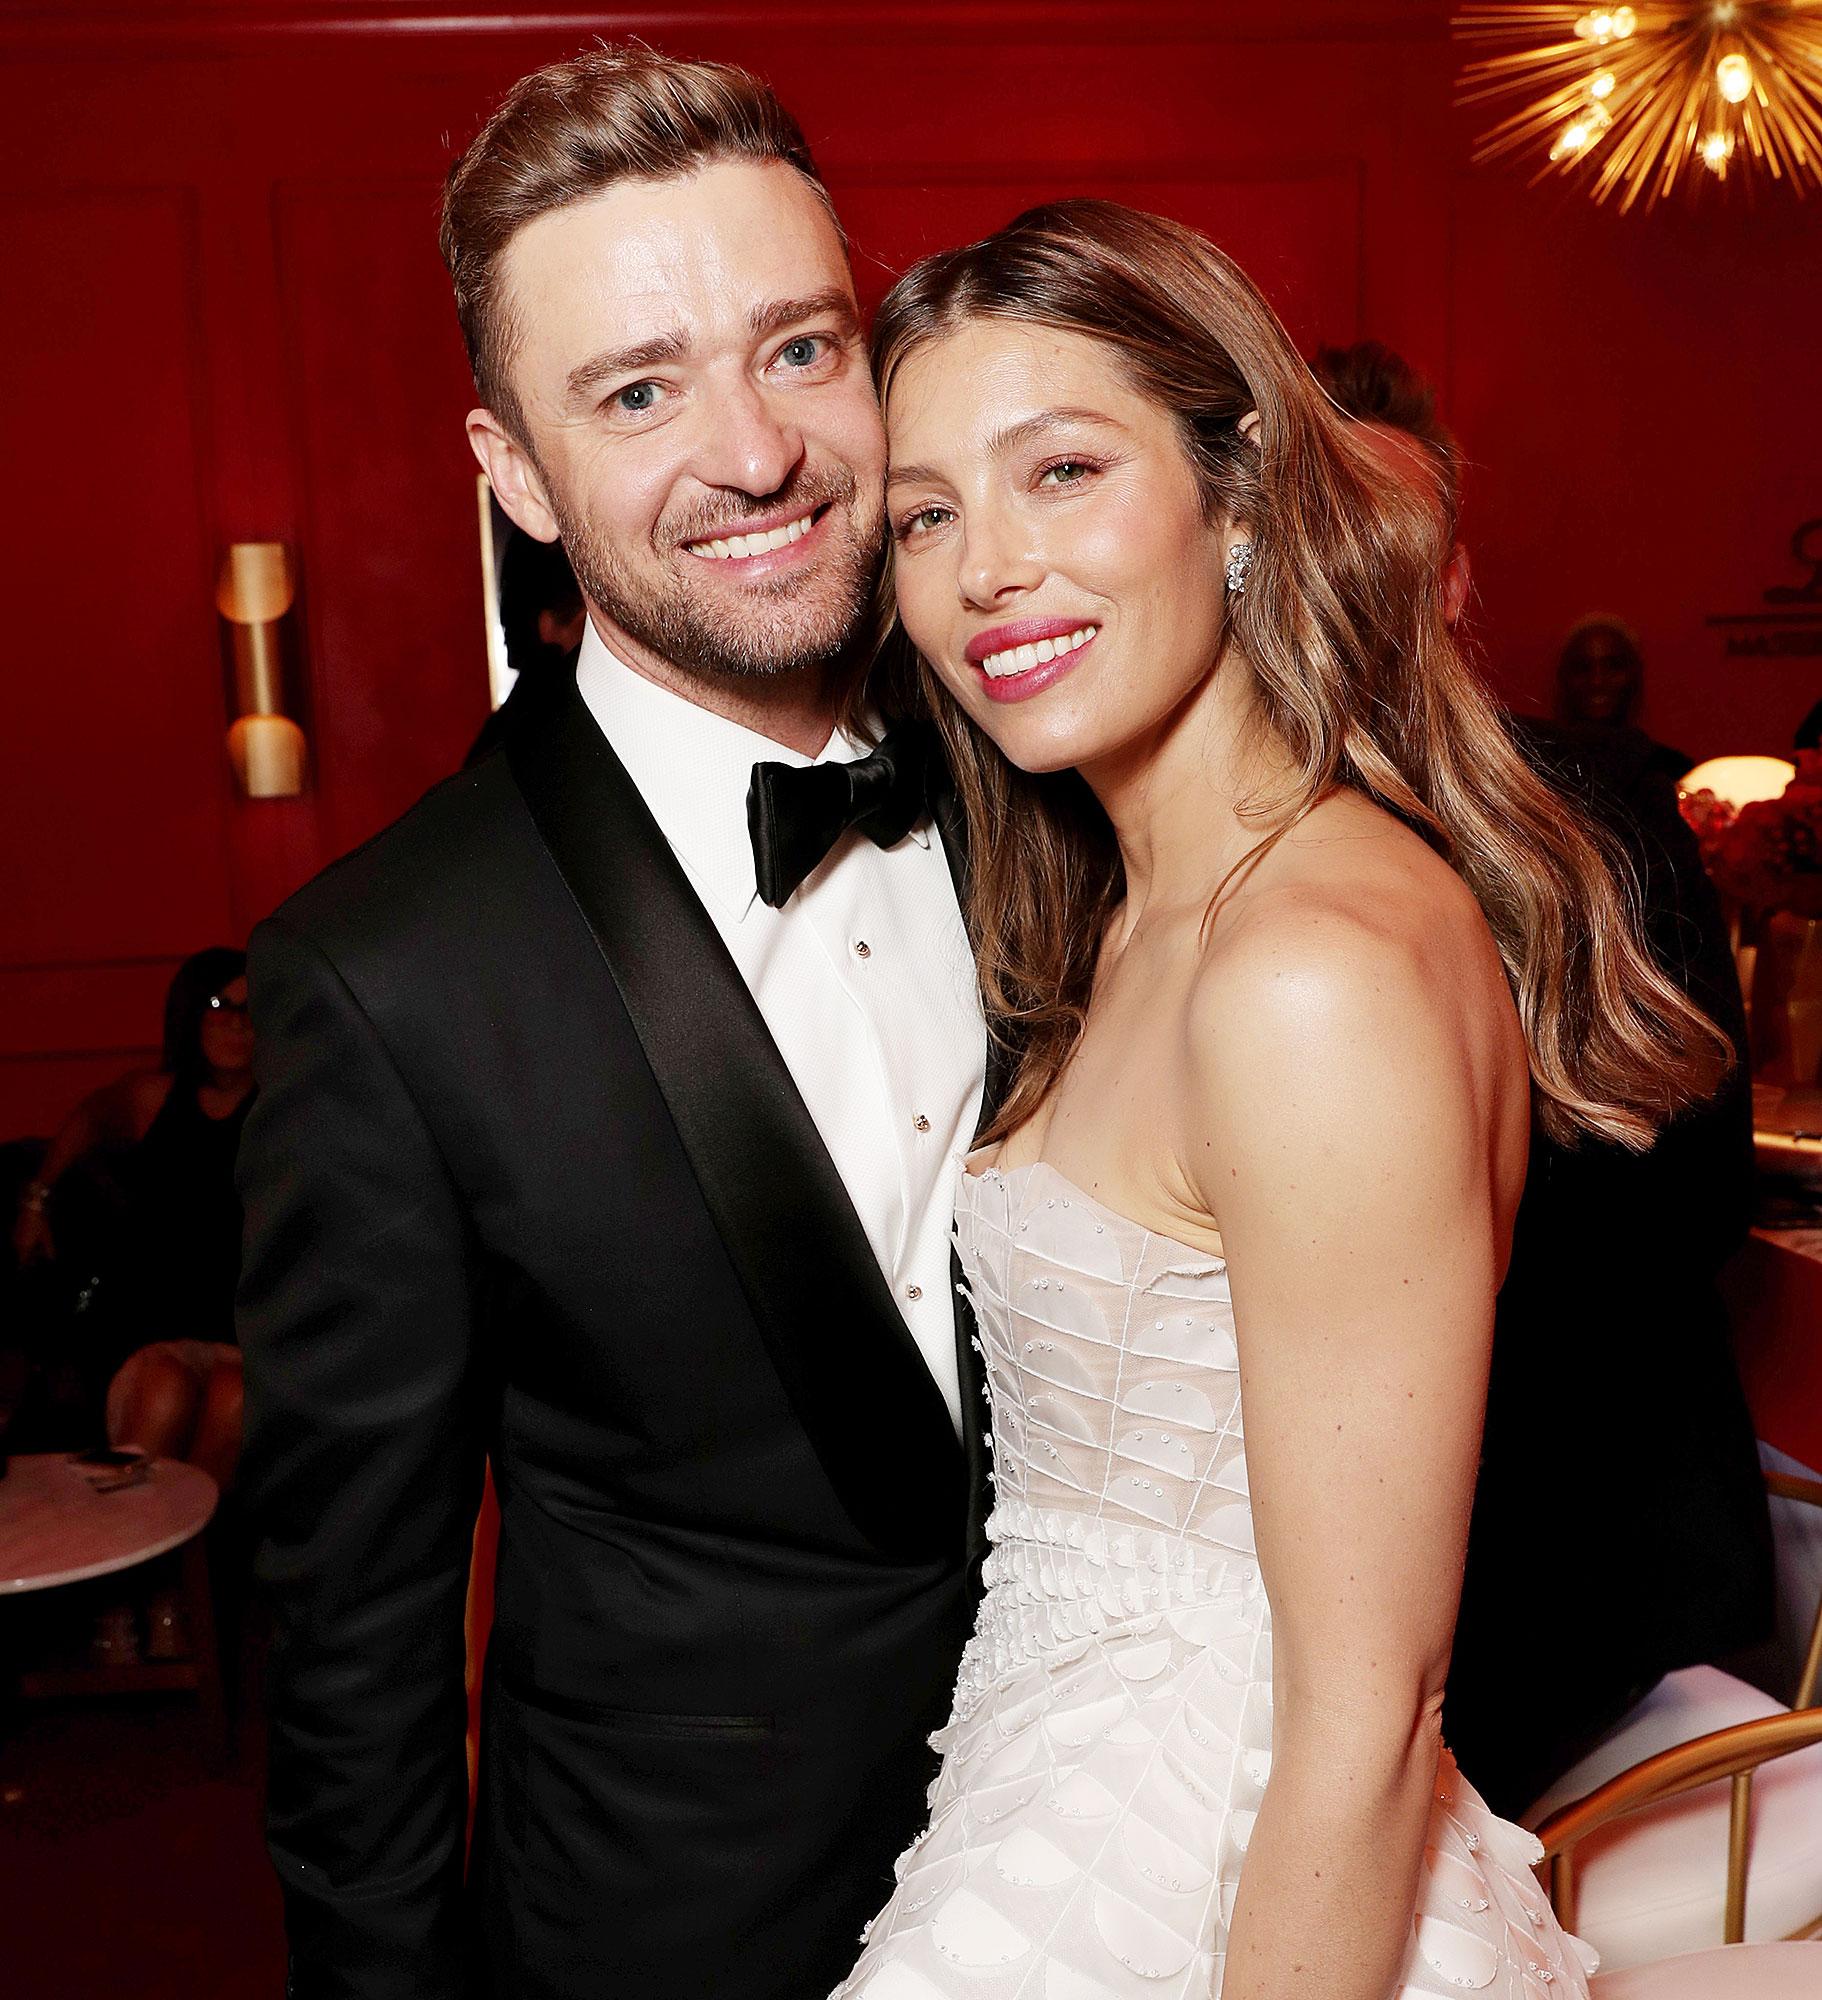 Jessica Biel Flirts With Justin Timberlake After Sexy ...